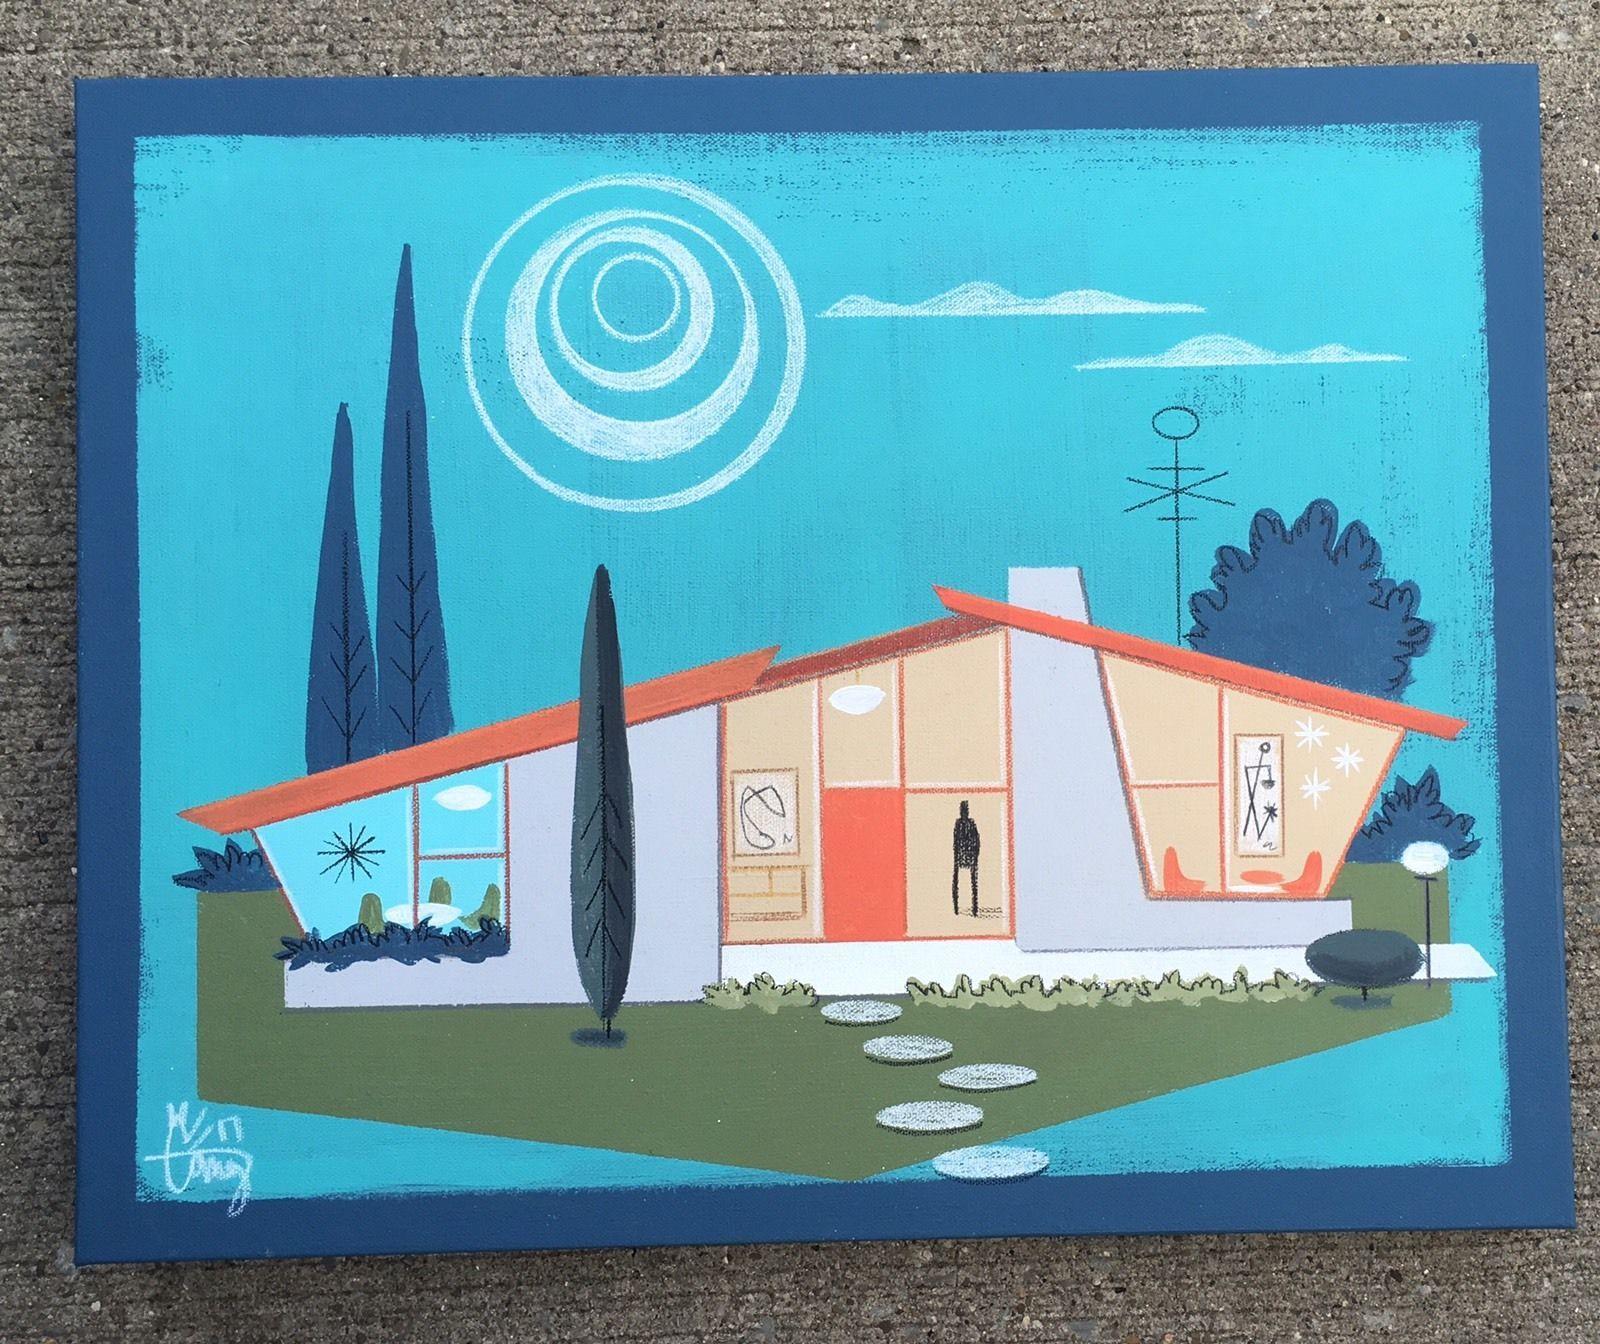 El Gato Gomez Painting Retro Mid Century Modern Atomic